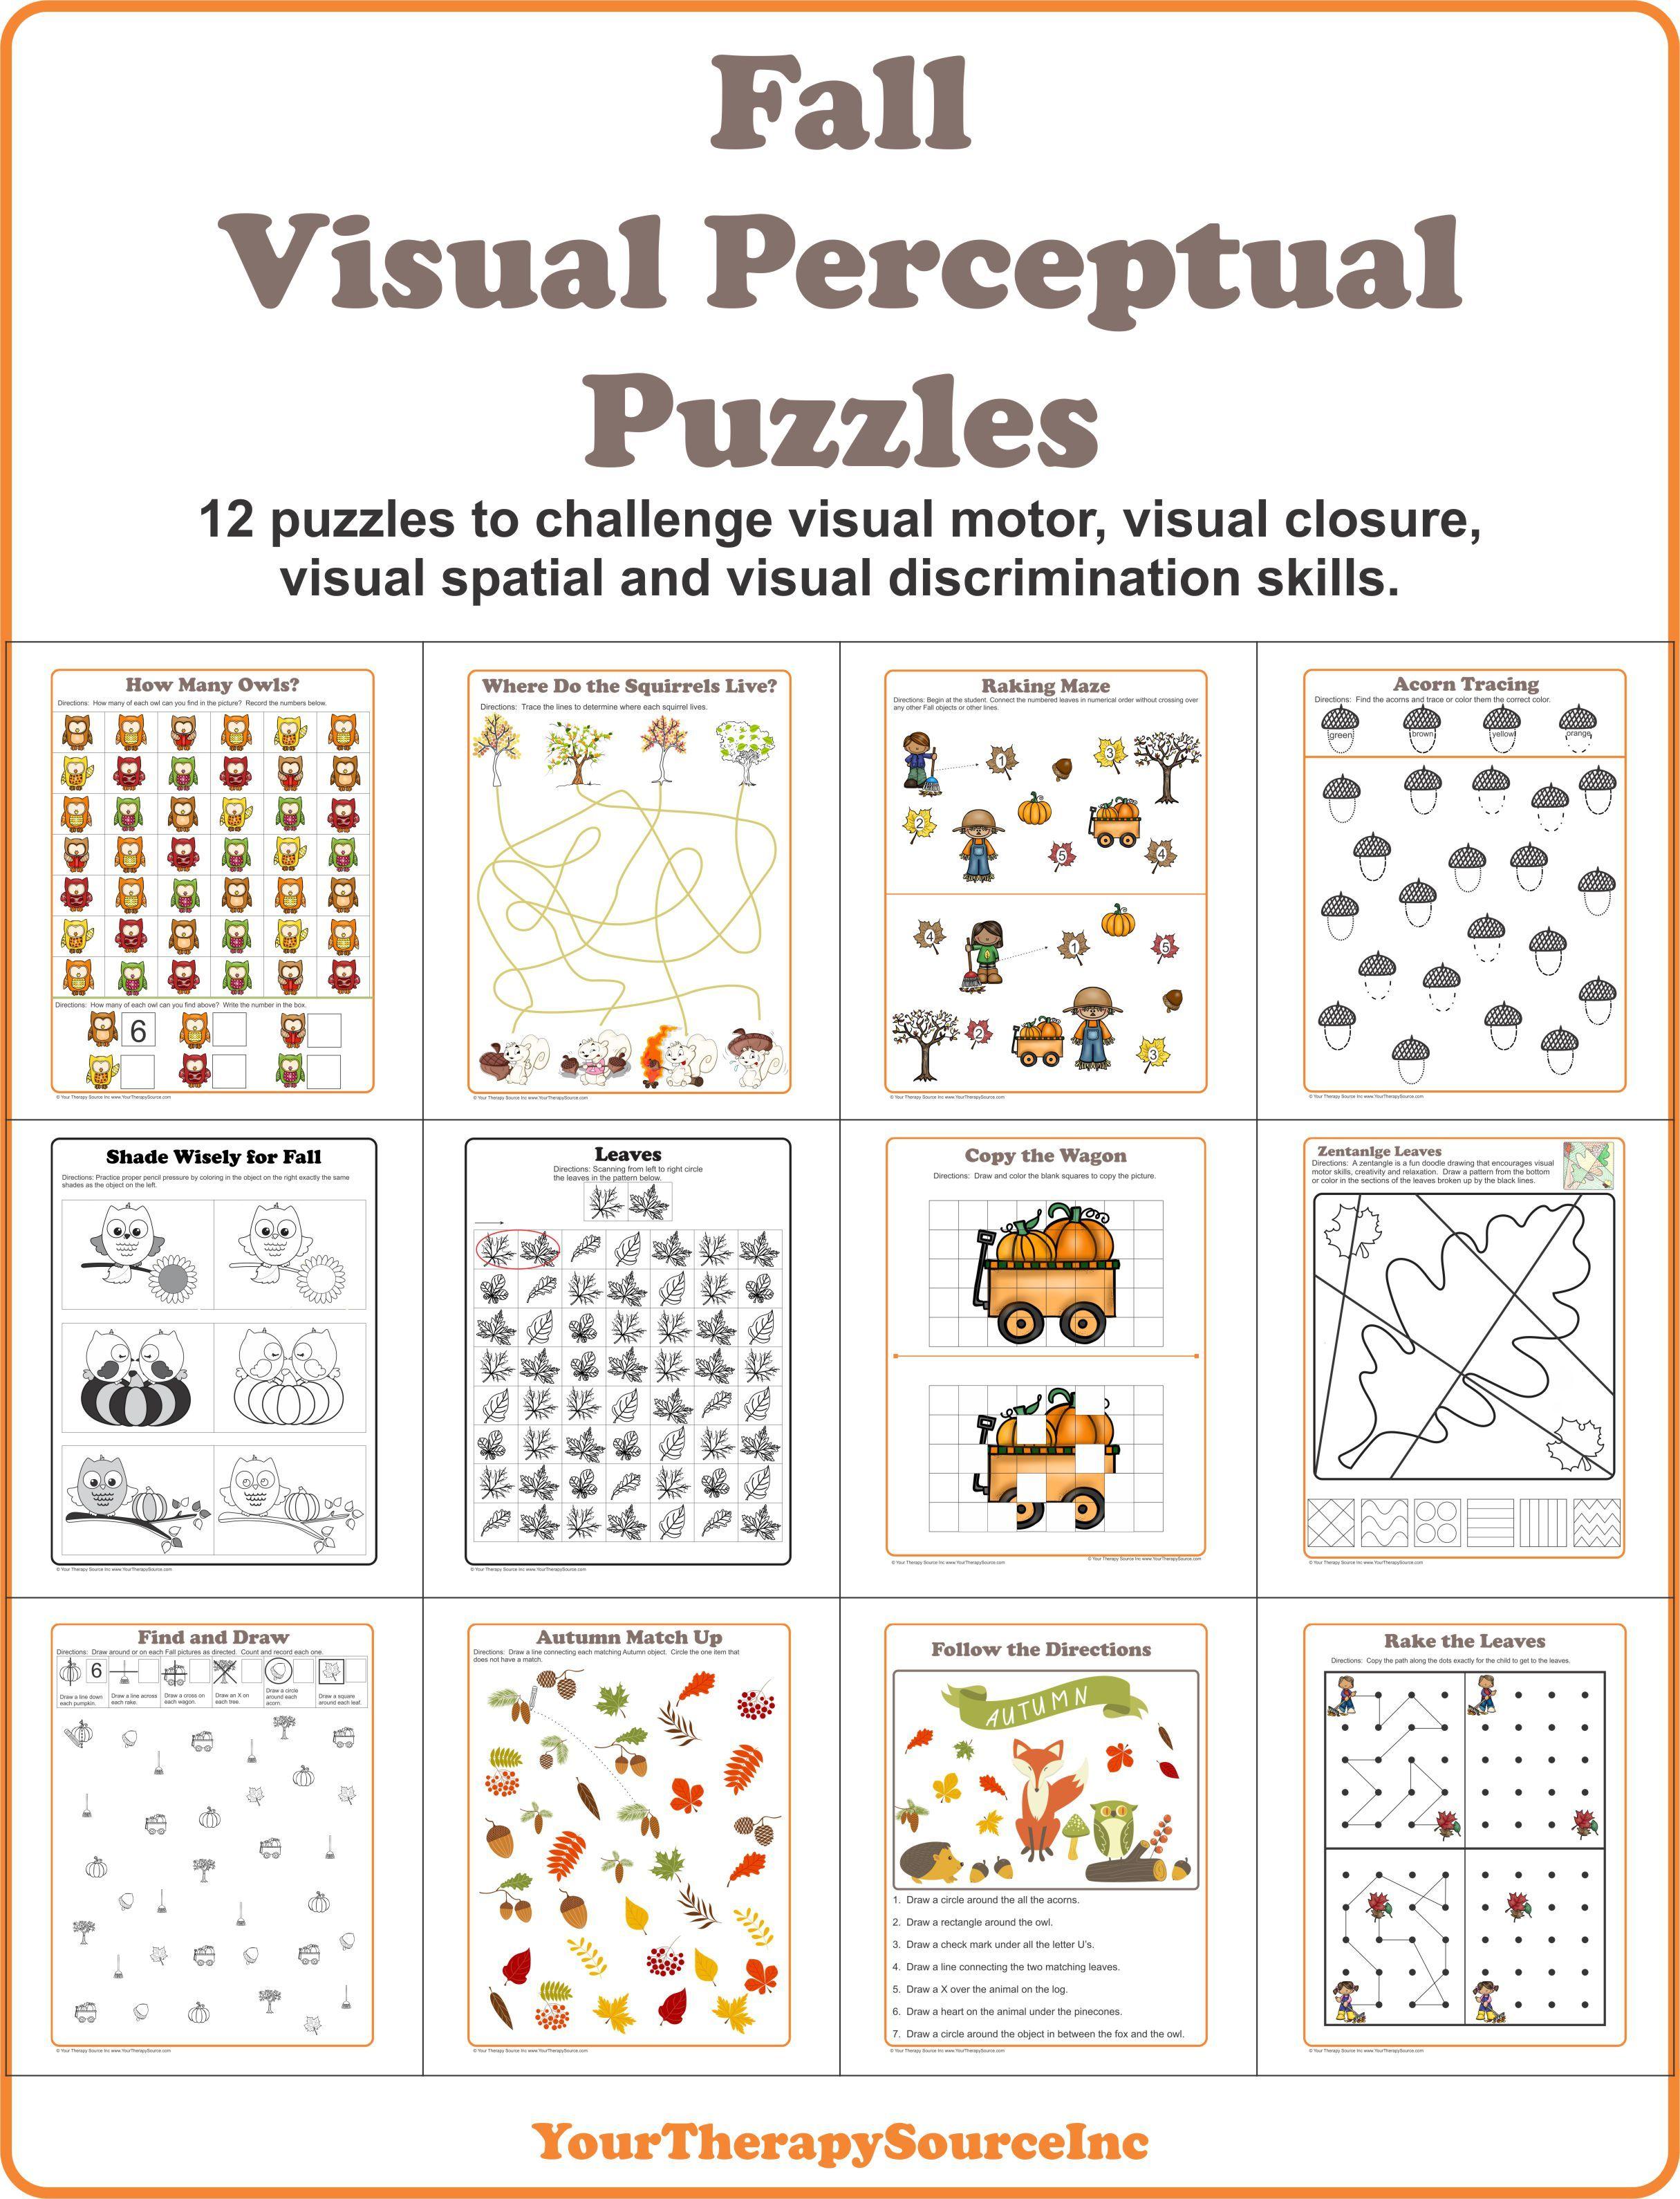 Fall Visual Perceptual Puzzles To Challenge Visual Motor